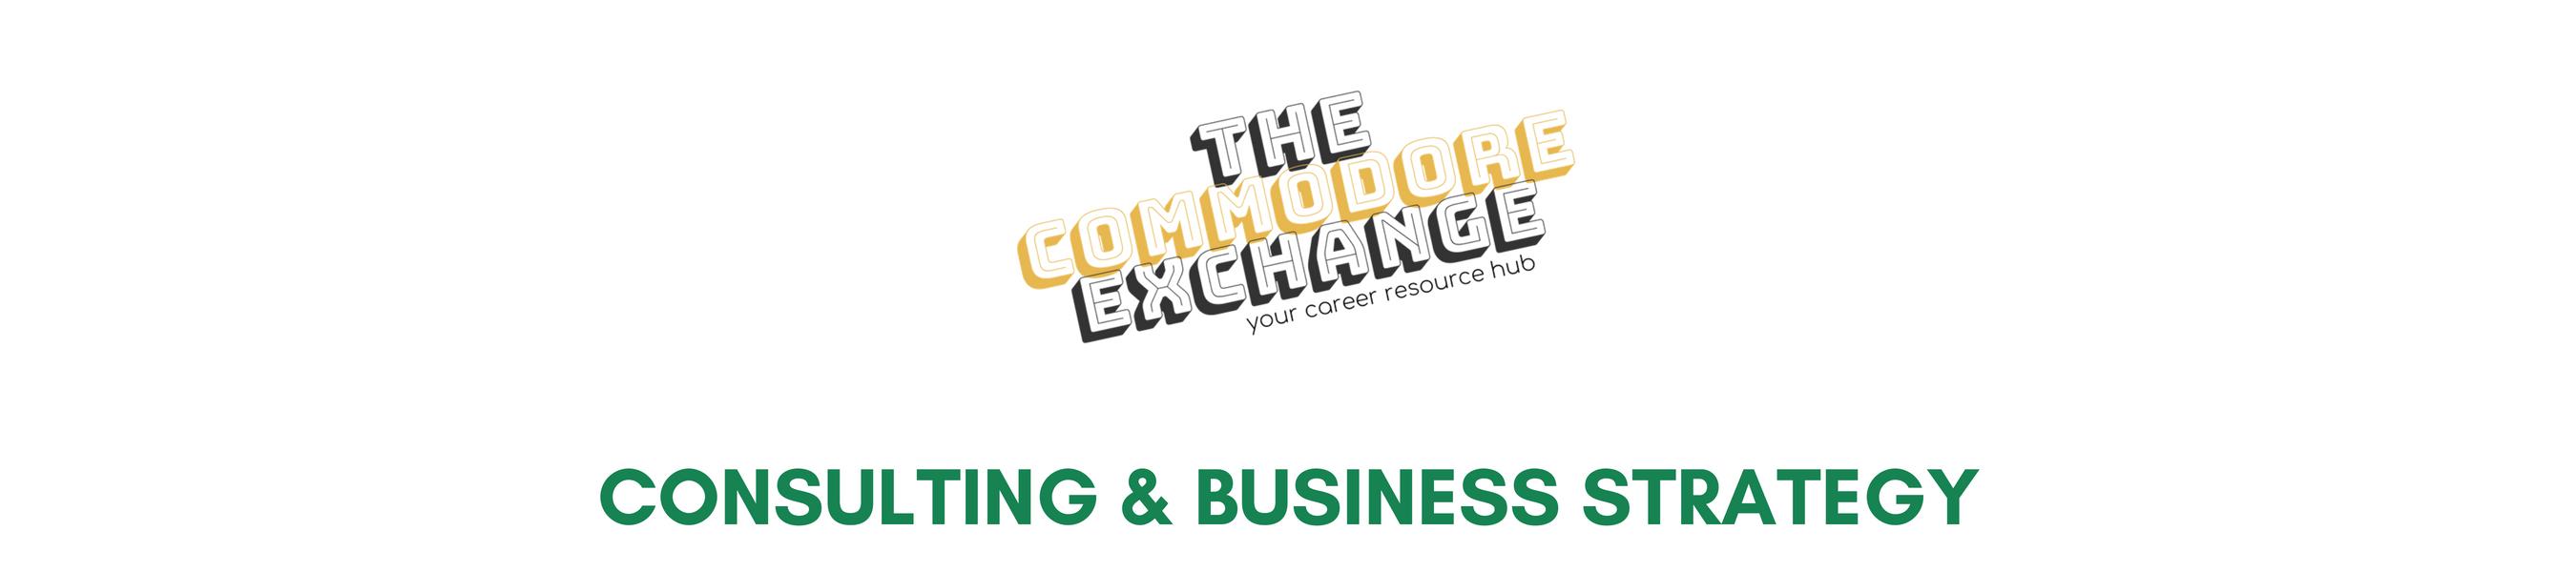 Consulting & Business Strategy | Career Center | Vanderbilt